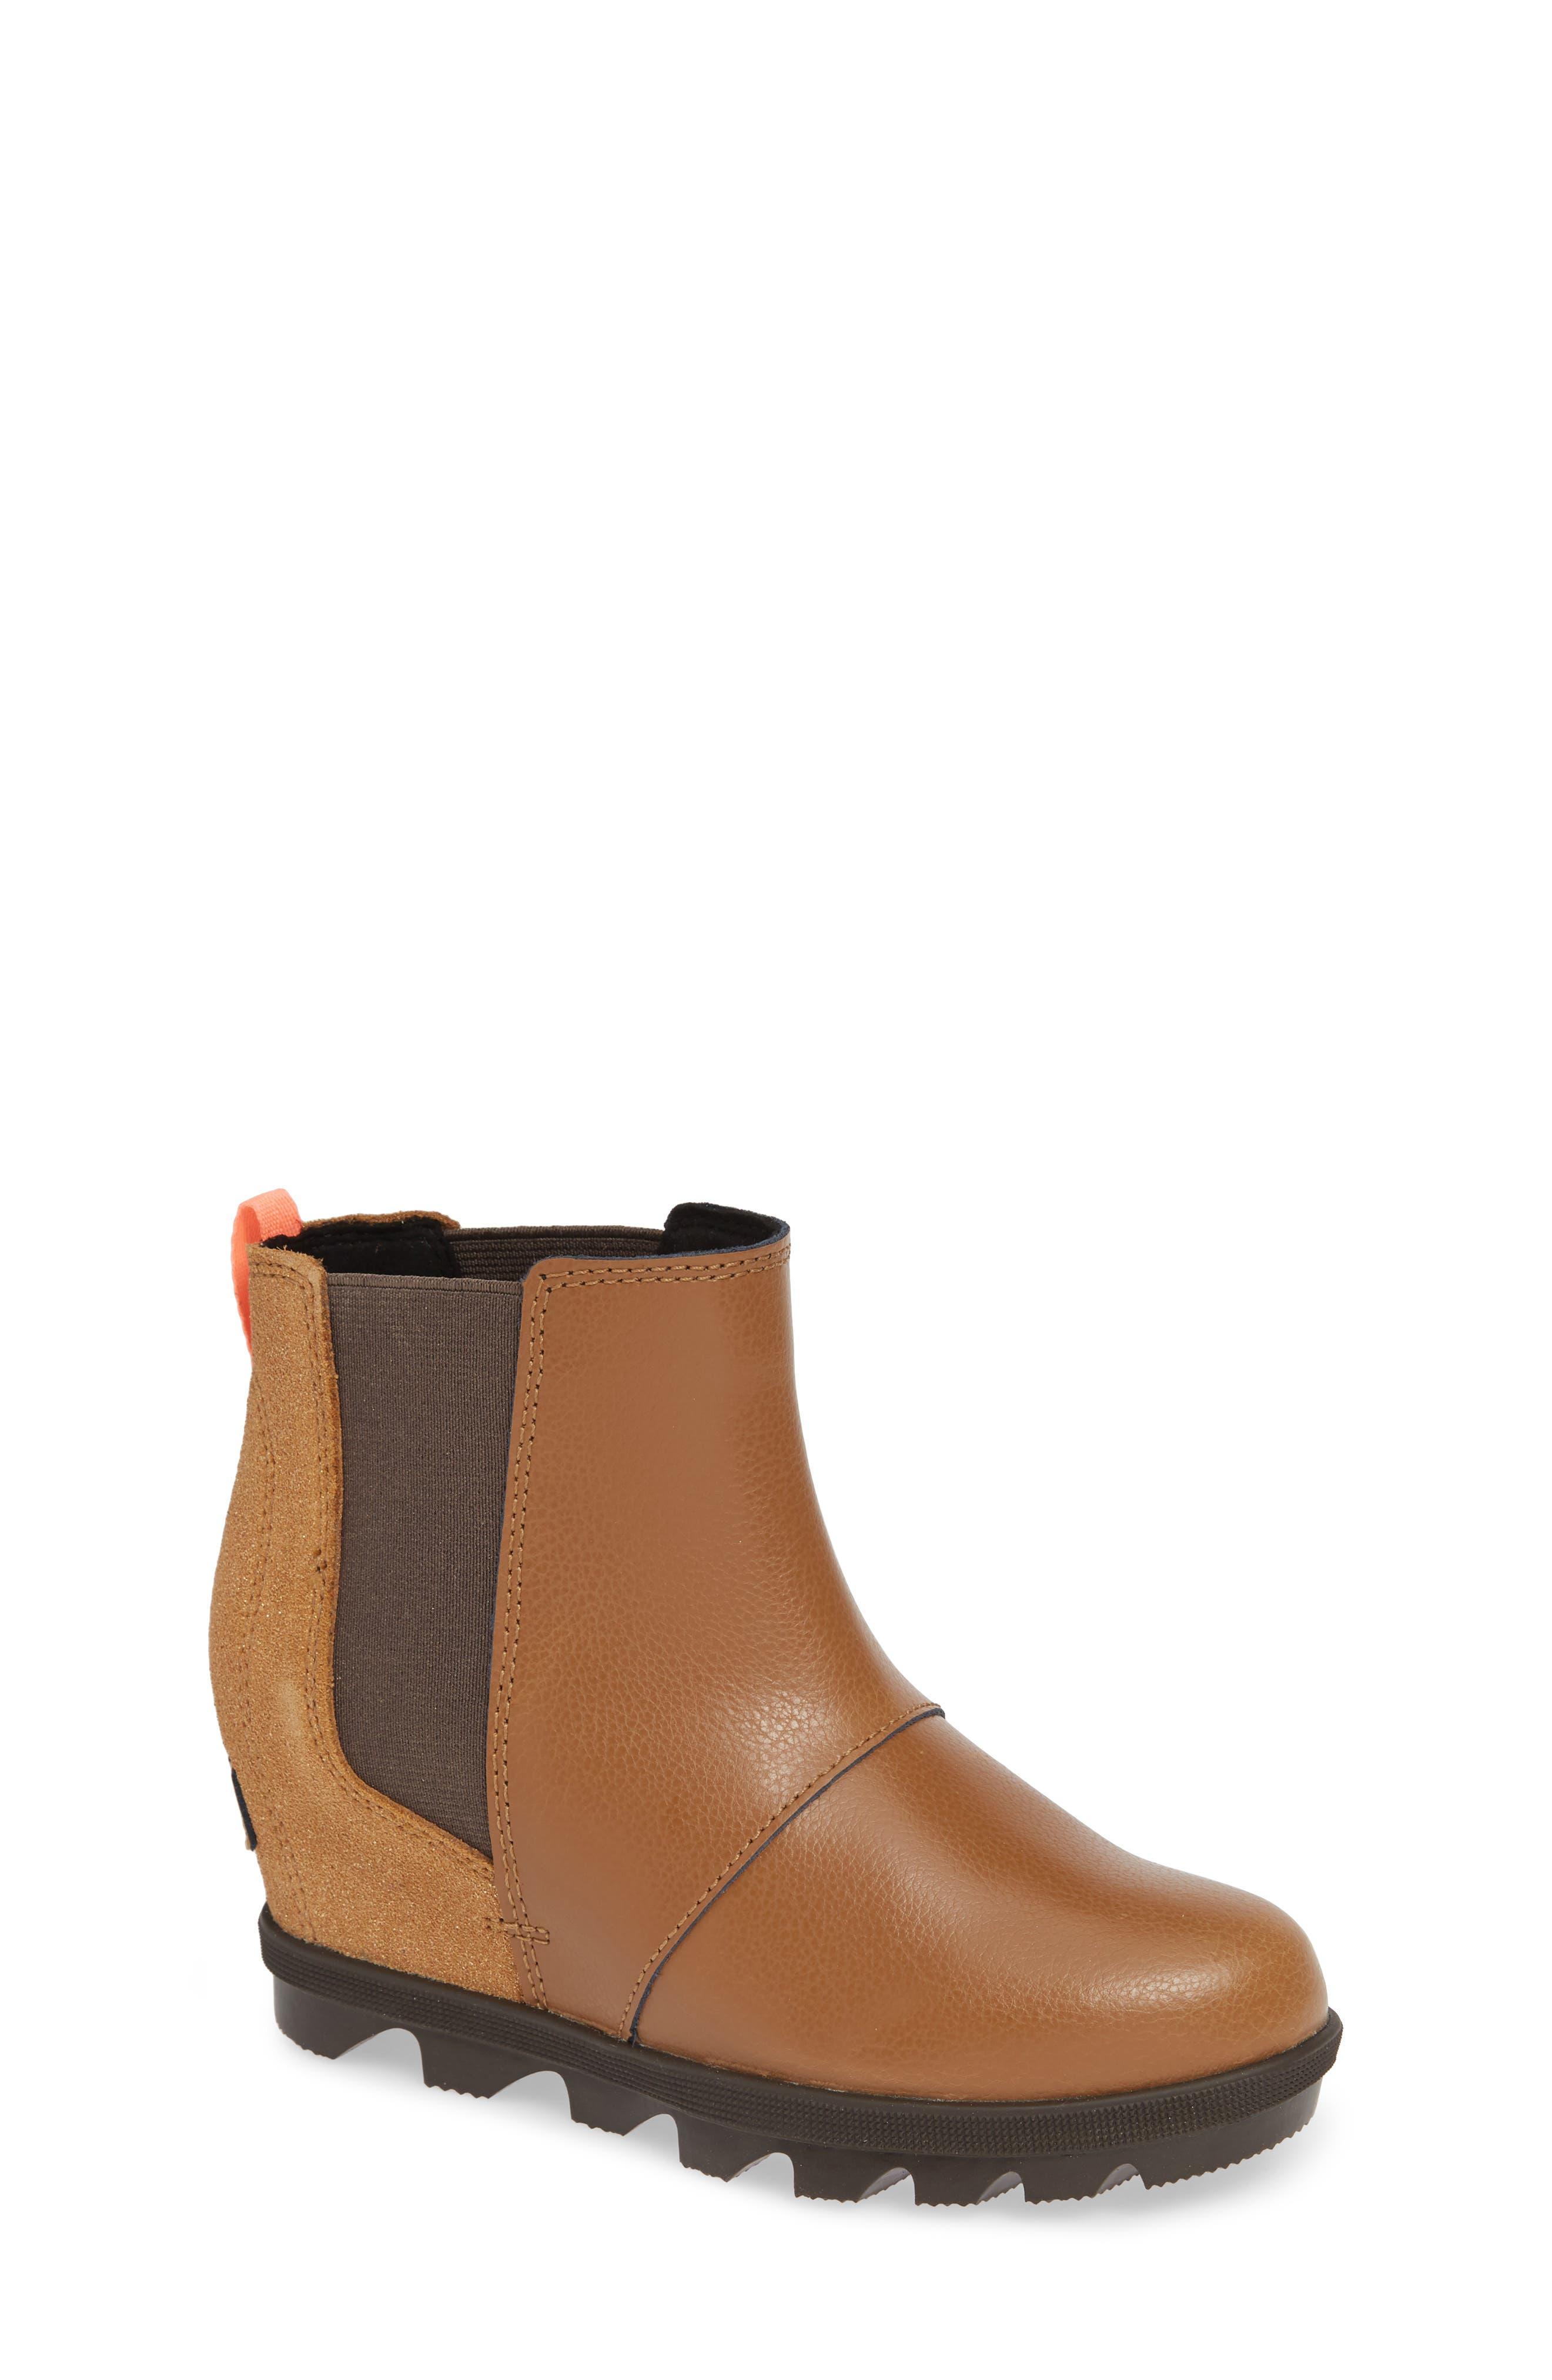 SOREL, Joan of Arc II Waterproof Wedge Chelsea Boot, Main thumbnail 1, color, CAMEL BROWN